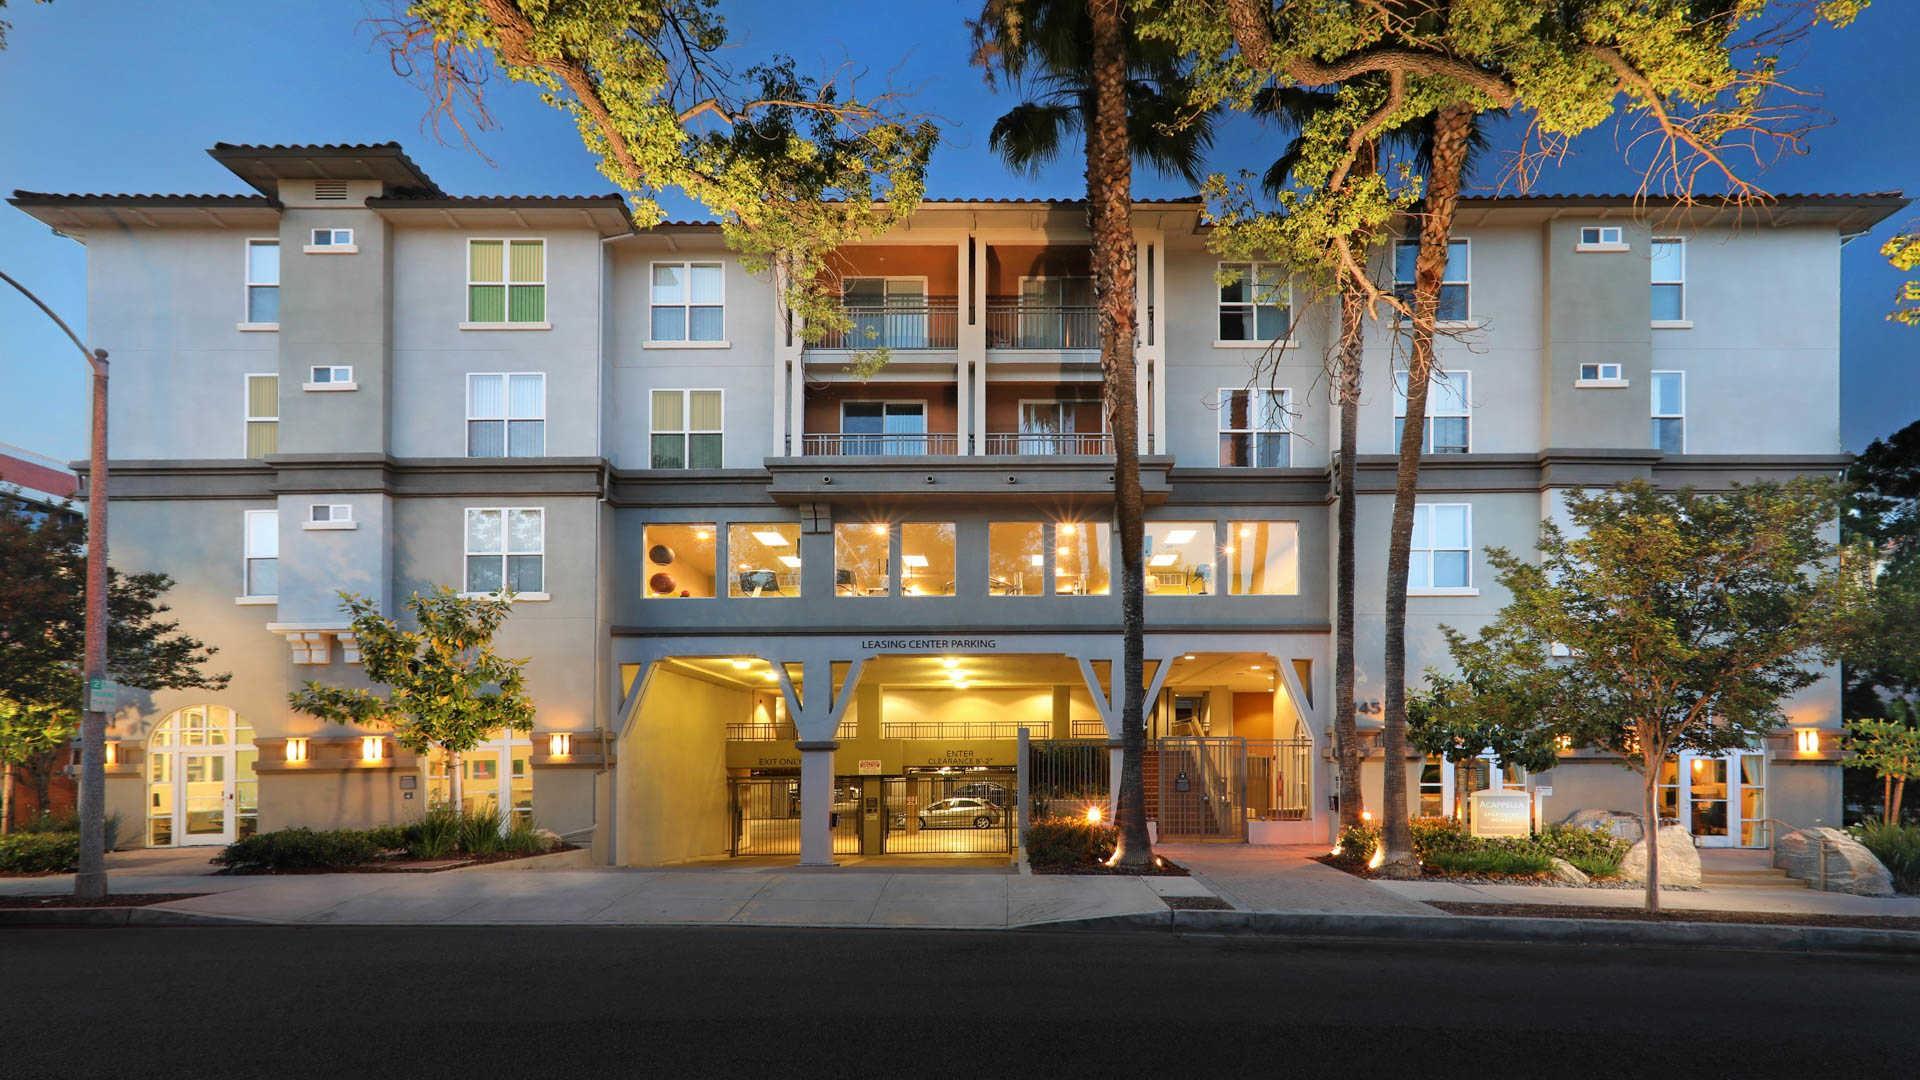 Apartments Near Art Center Acappella Pasadena for Art Center College of Design Students in Pasadena, CA